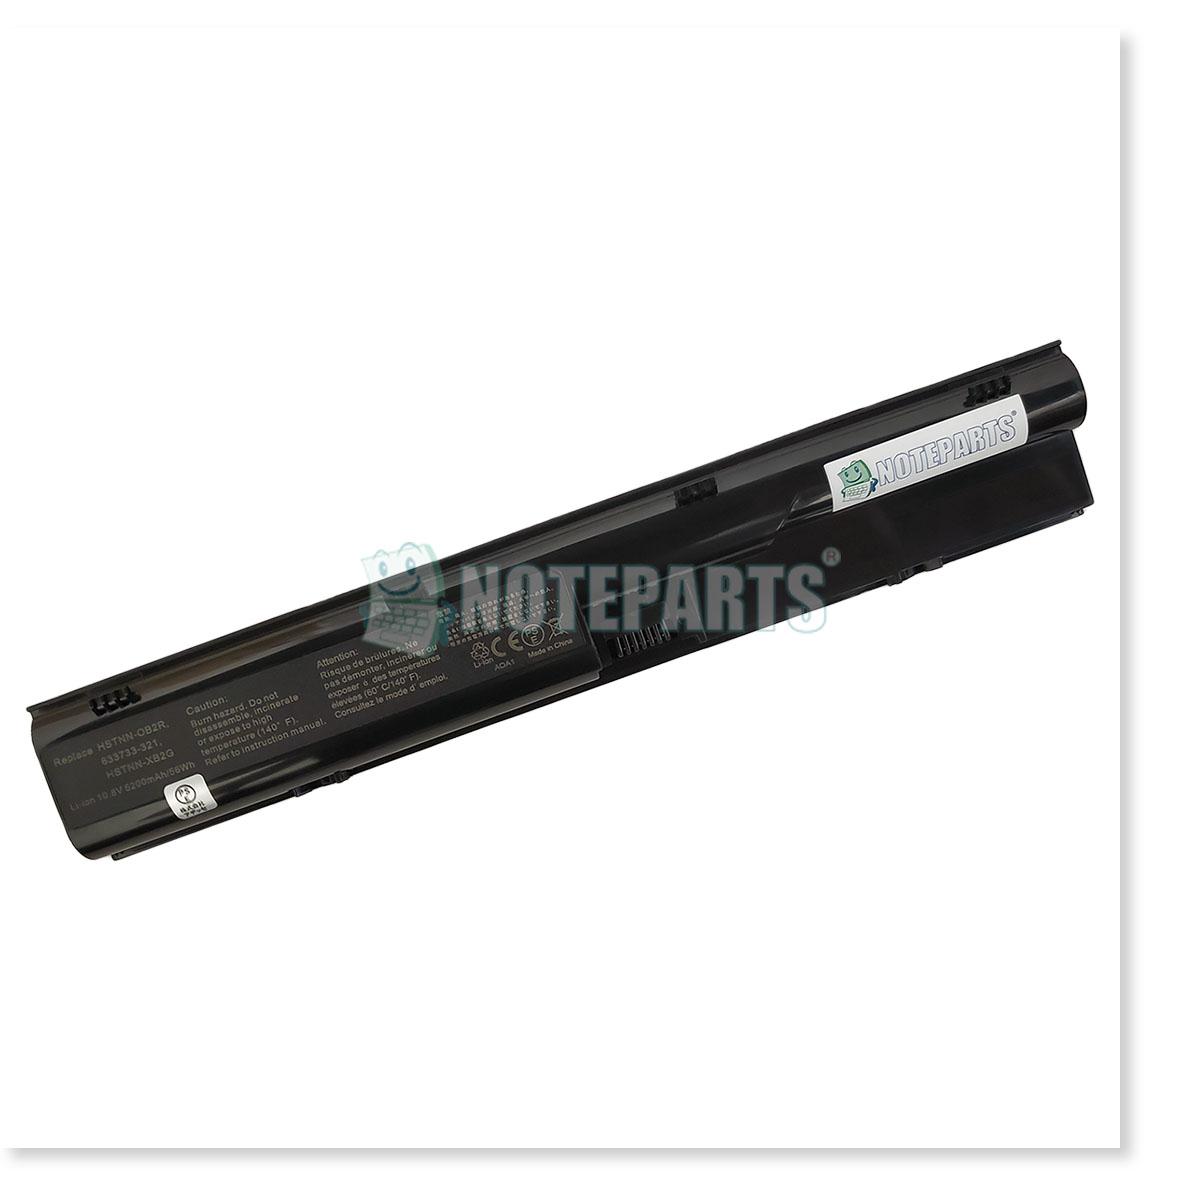 HP ProBook 4430s 4530s バッテリー PR06 QK646AA 633805-001 633733-321対応